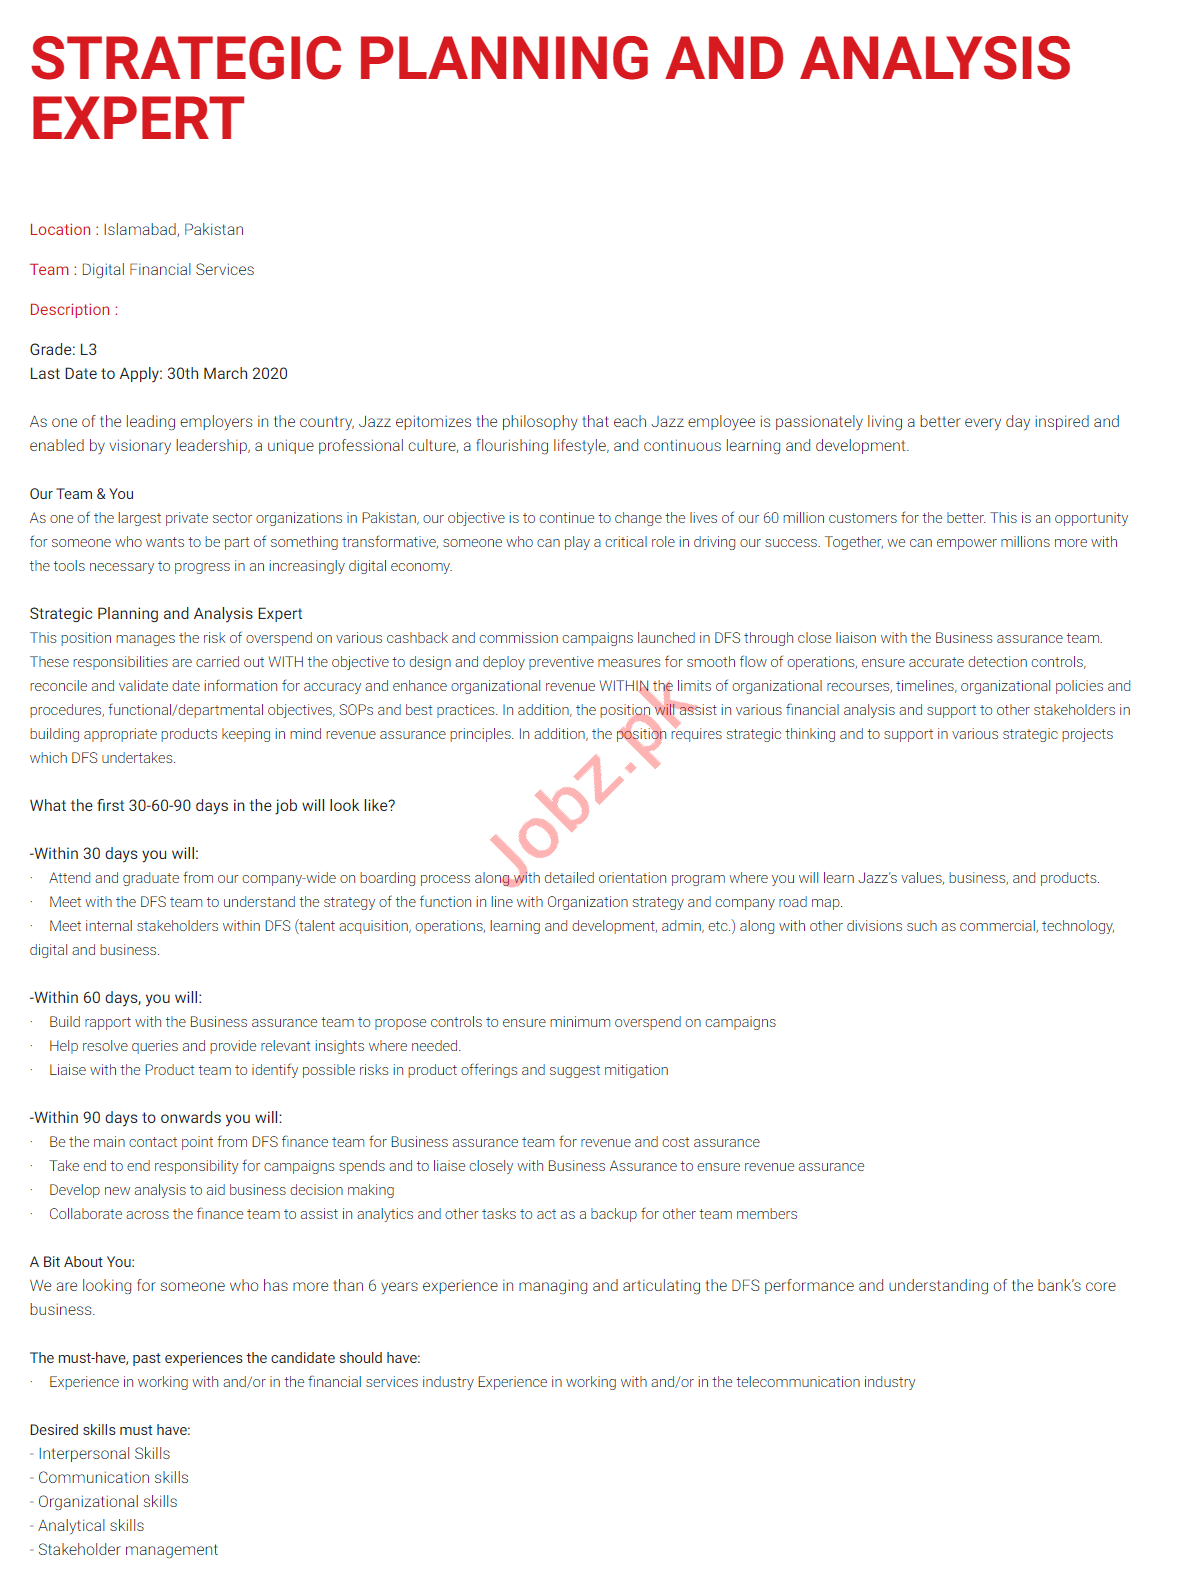 Strategic Planning & Analysis Expert Jobs in Jazz Telecom